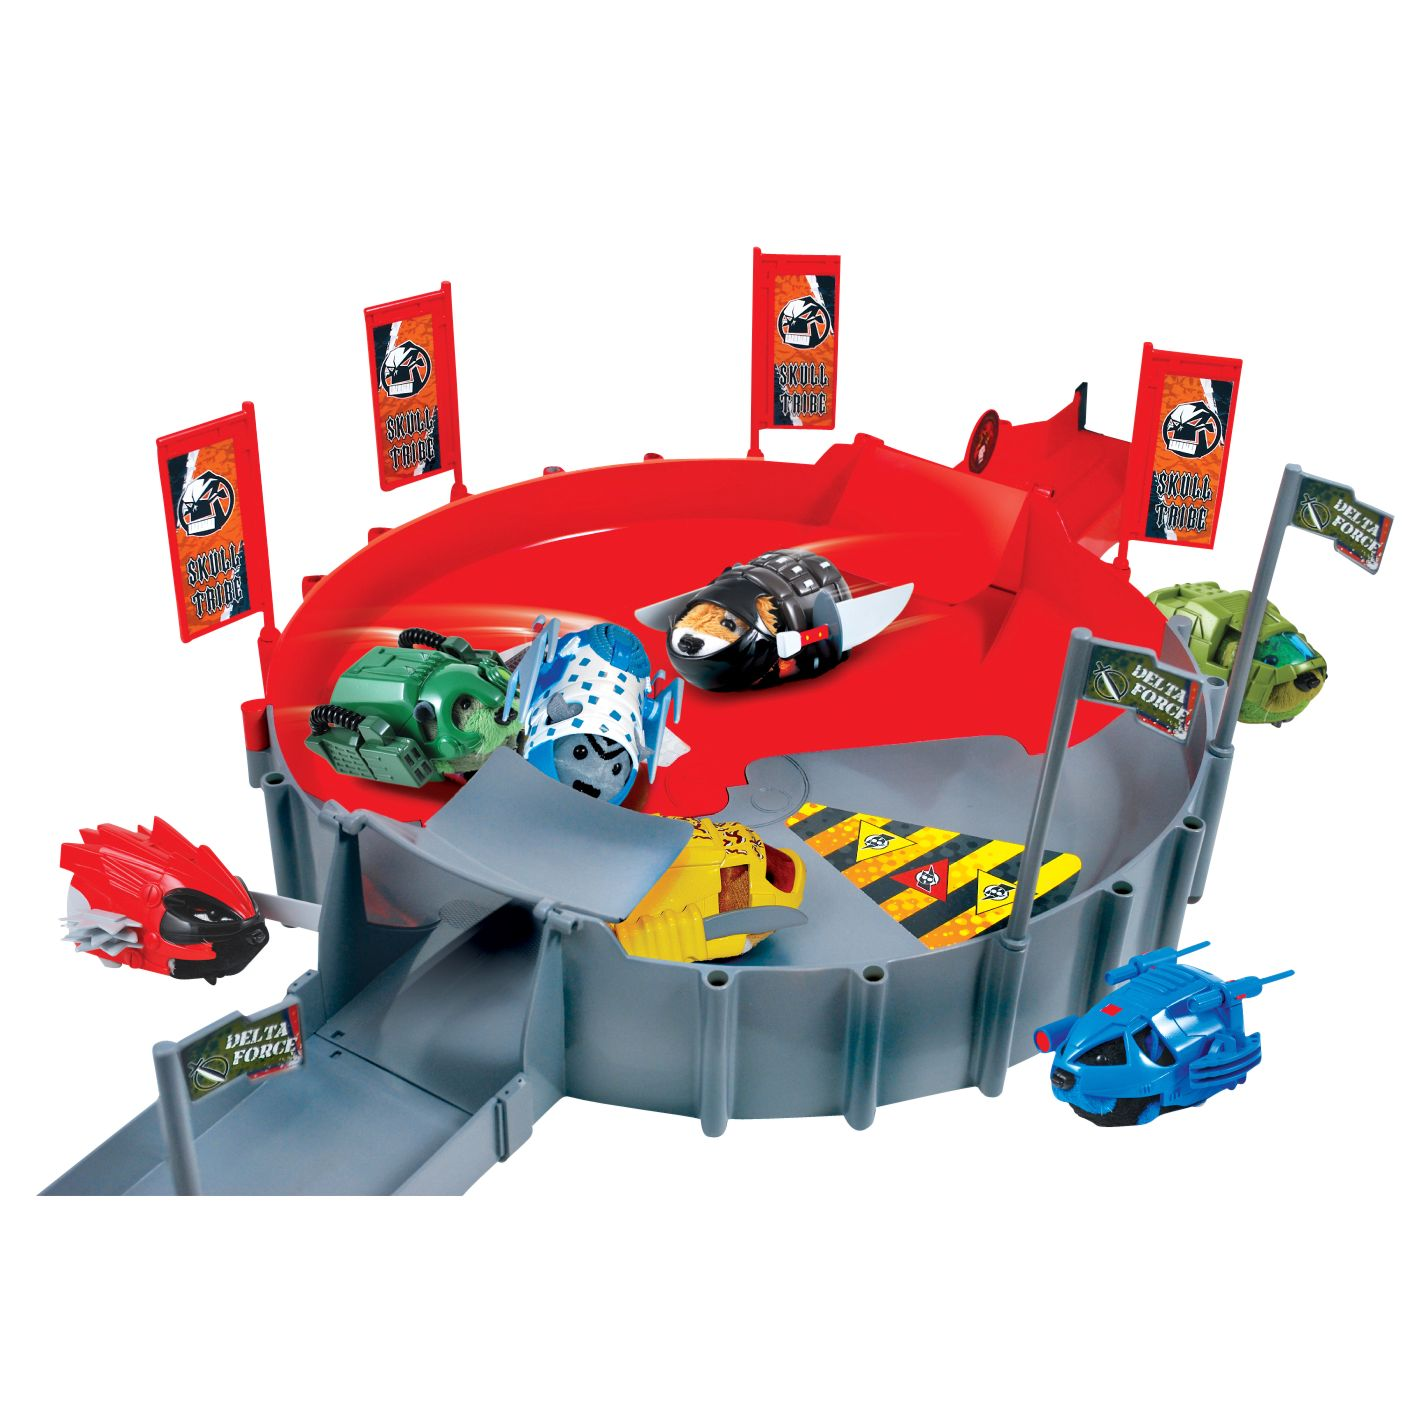 Kung Zhu Hamsters: Battle Arena Playset